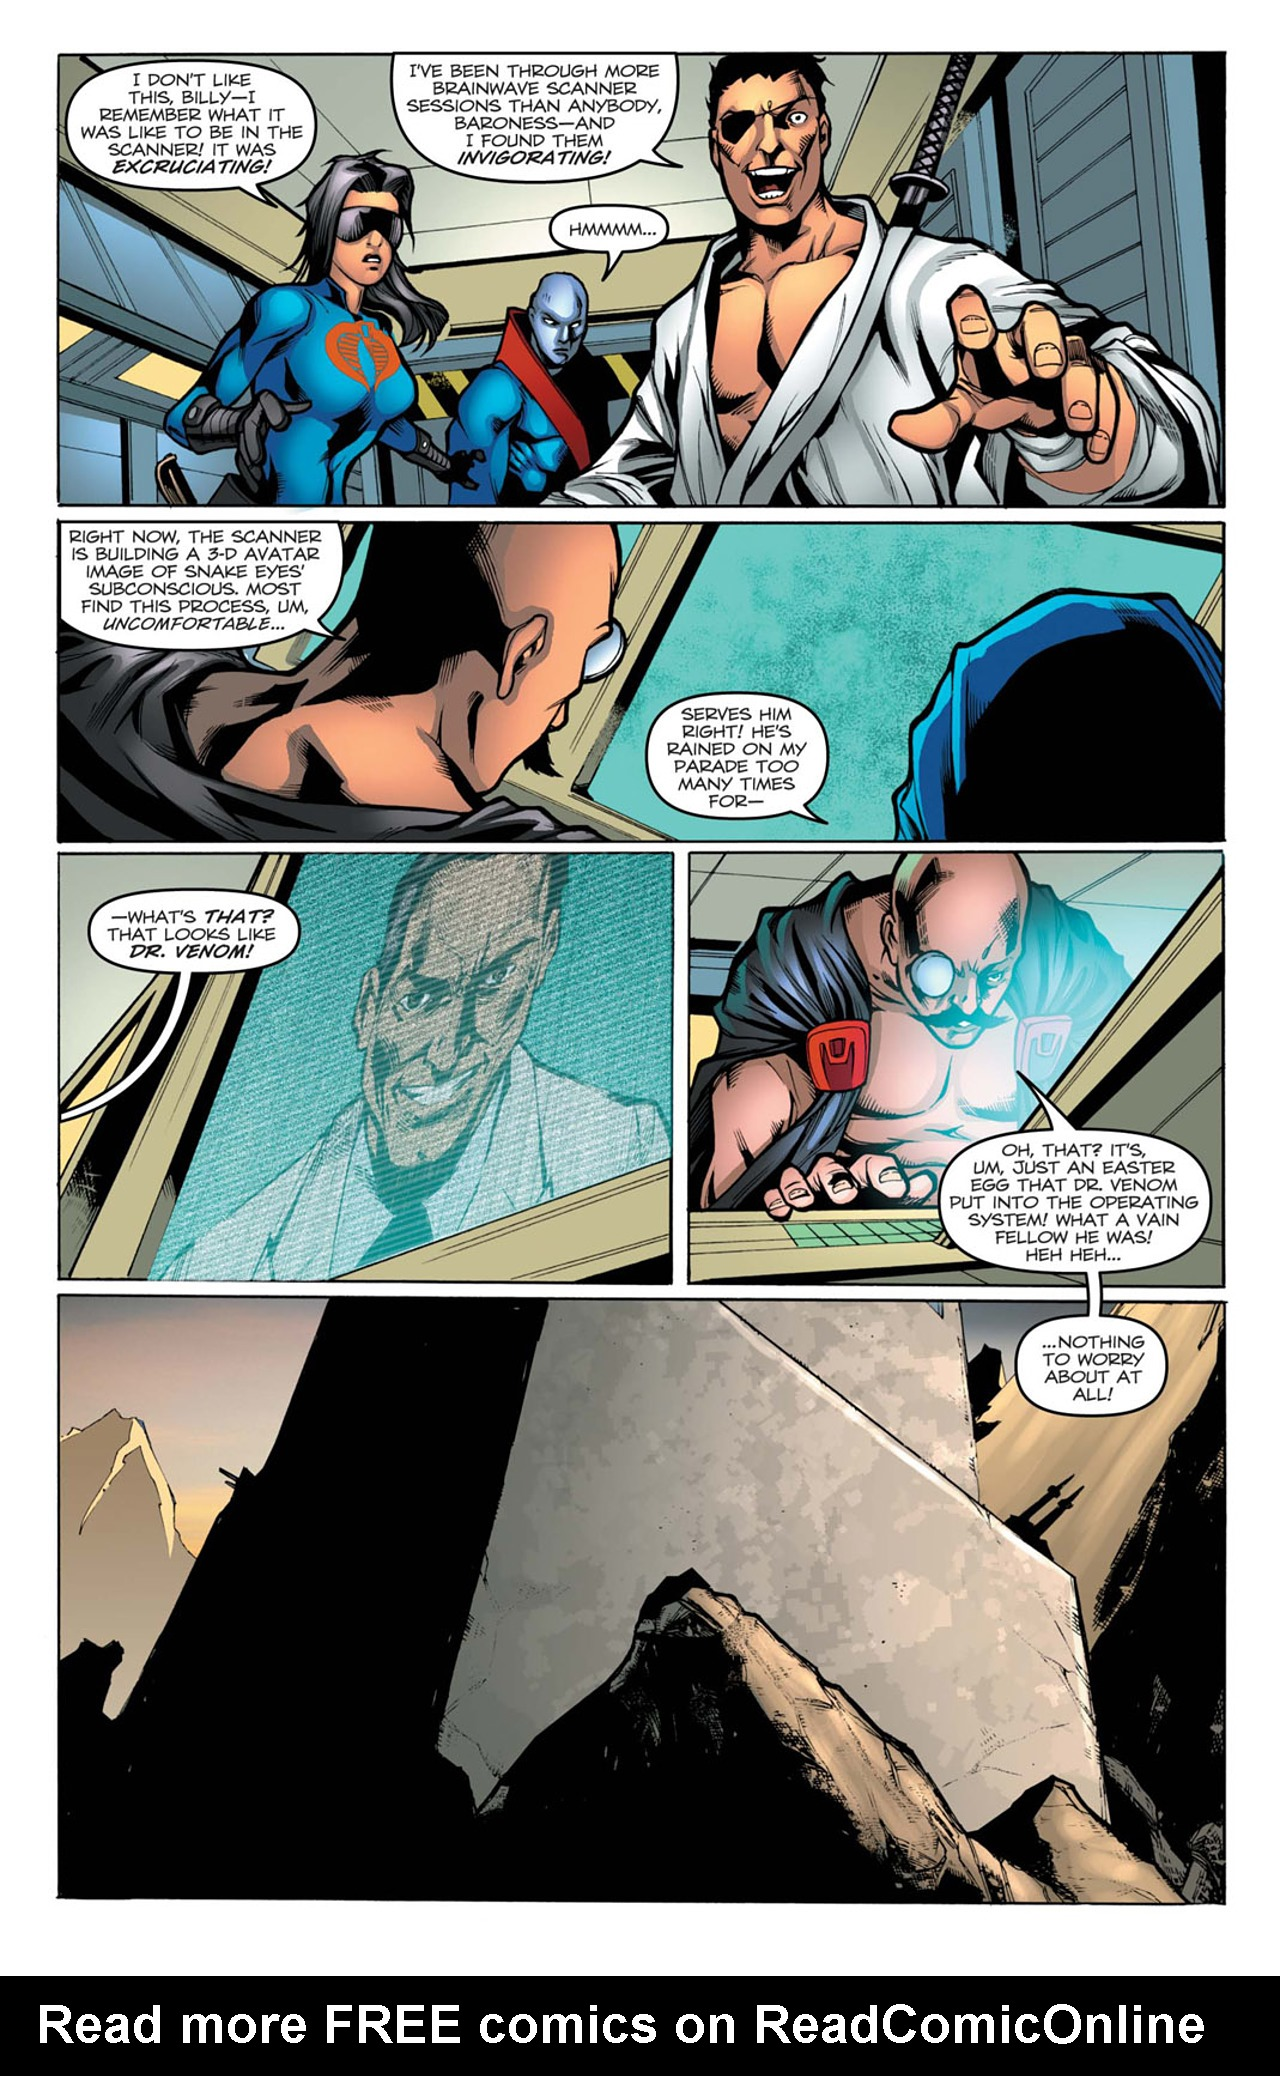 G.I. Joe: A Real American Hero 160 Page 5